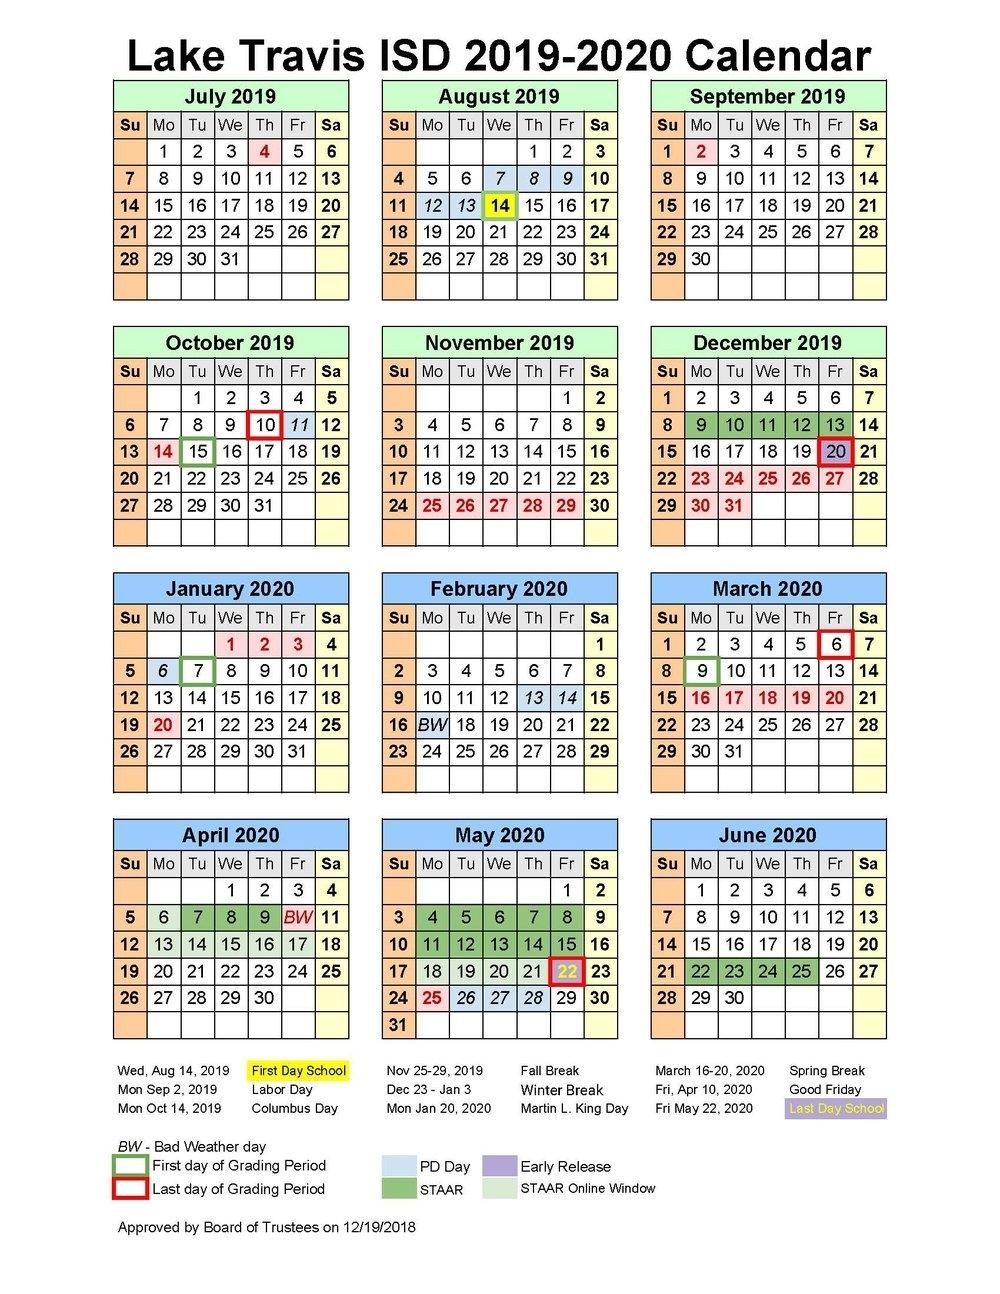 School Matters with Stephen F Austin 2019 2020 Calendar